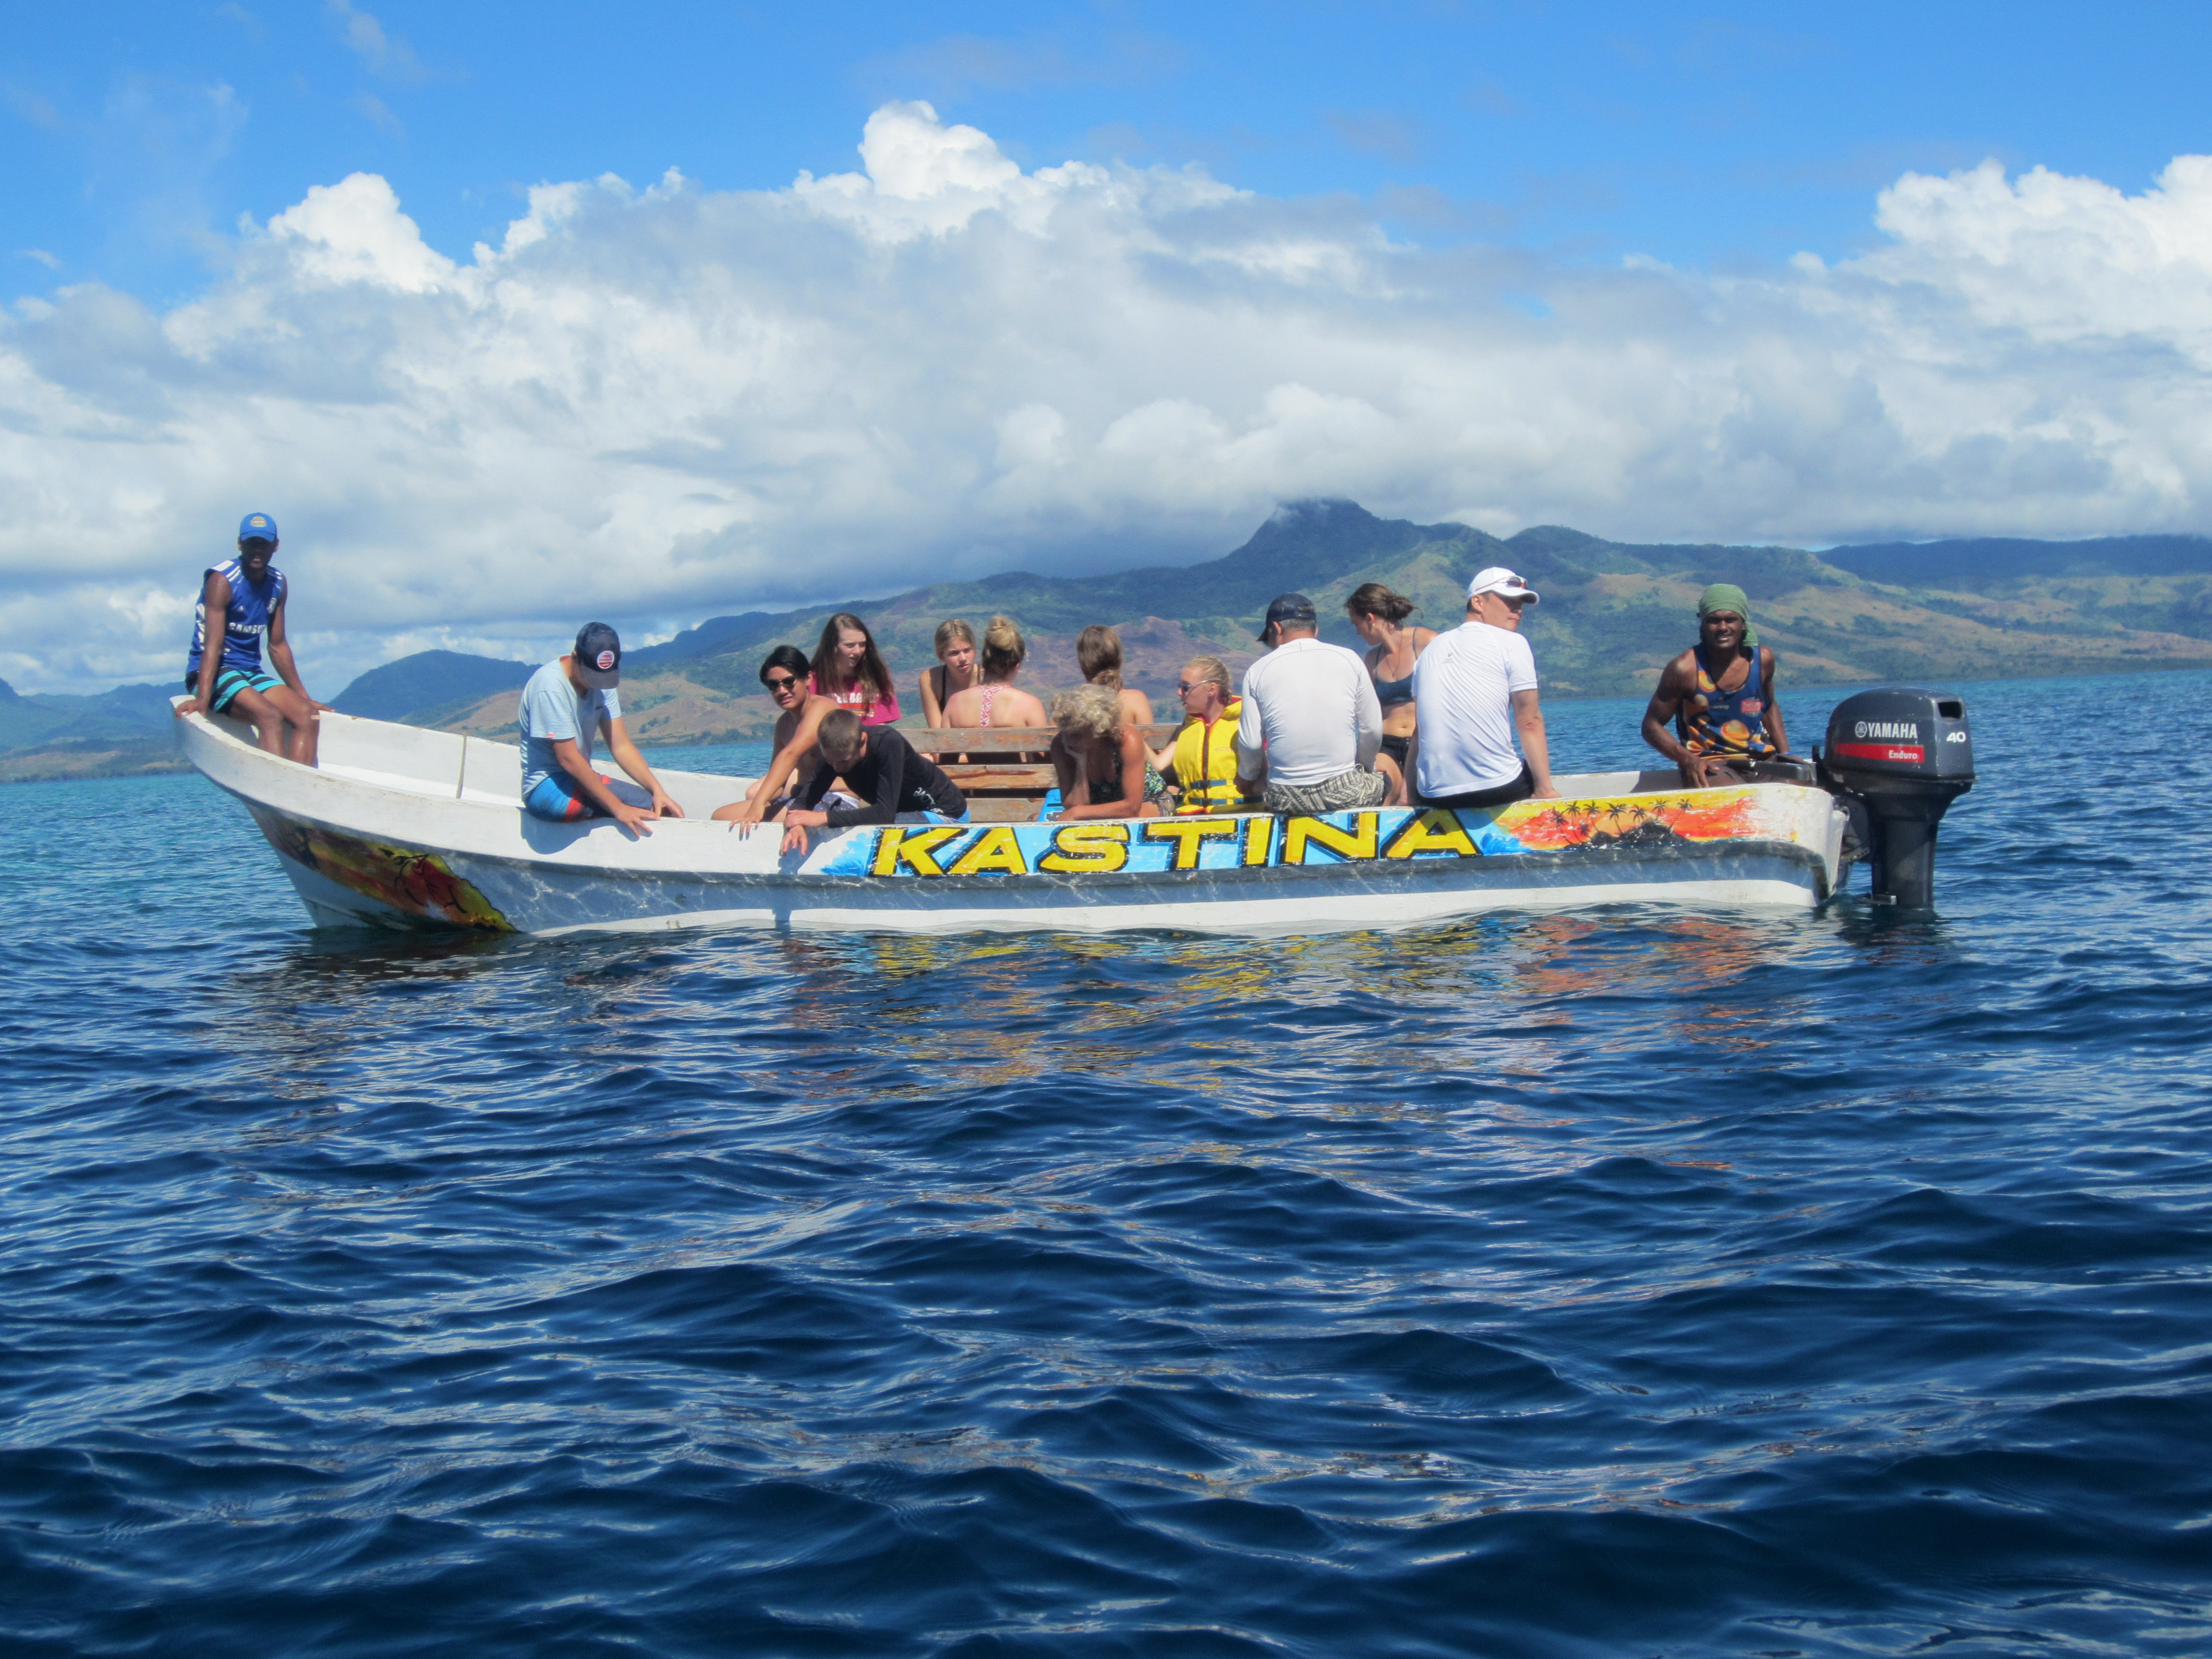 Summer Program - Preserving the Environment | Global Works - Fiji Islands: Building Community